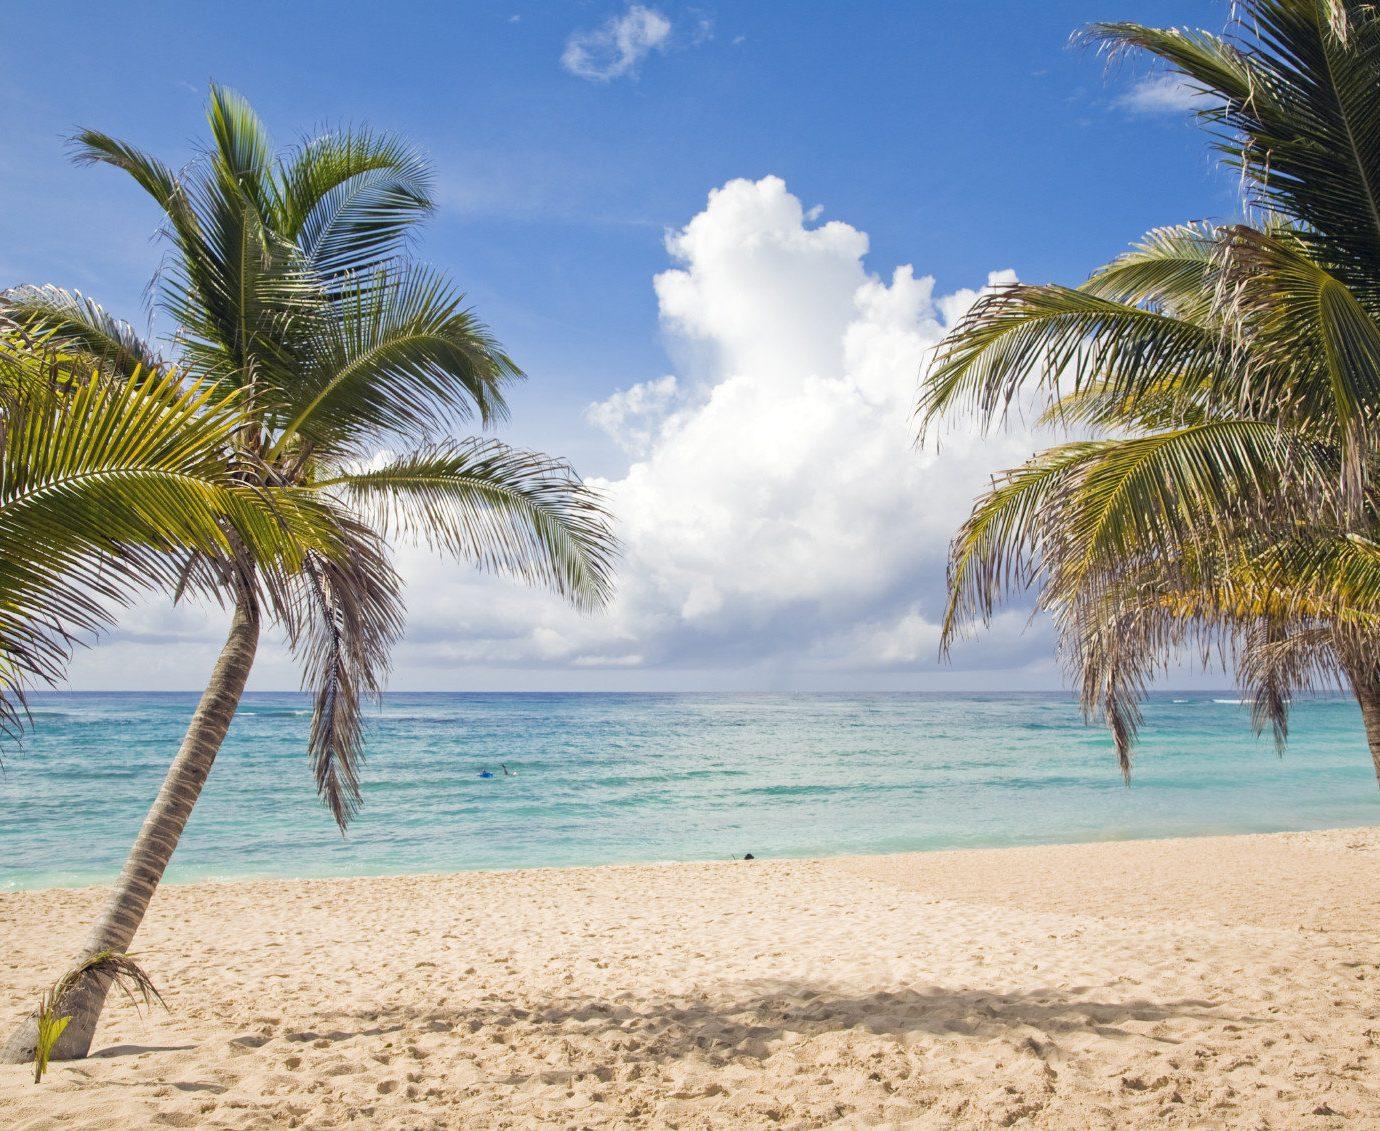 All-Inclusive Resorts Hotels Romance Trip Ideas outdoor tree palm Beach sky water plant shore body of water Sea vacation caribbean Ocean palm family tropics arecales woody plant Coast sand sandy bay Lagoon shade